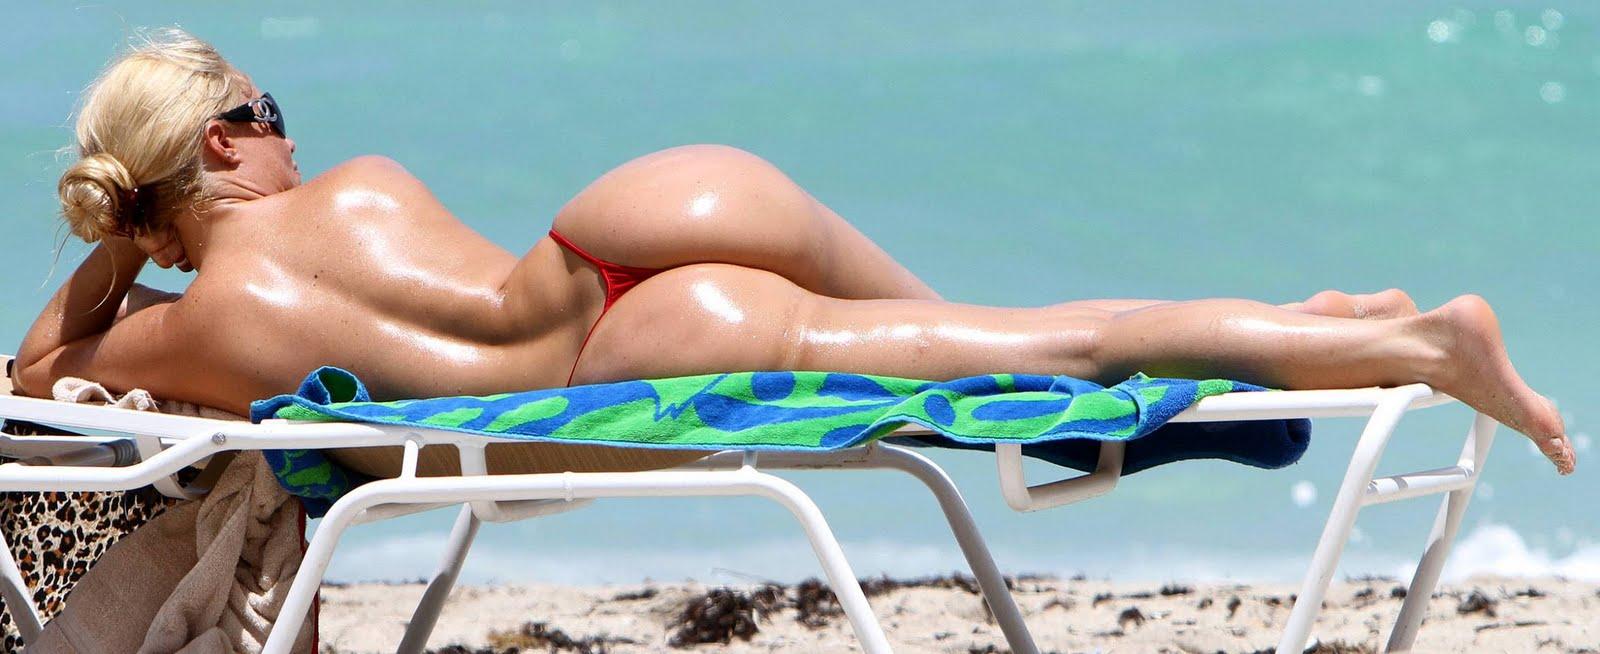 Nicole coco austin bikini are mistaken